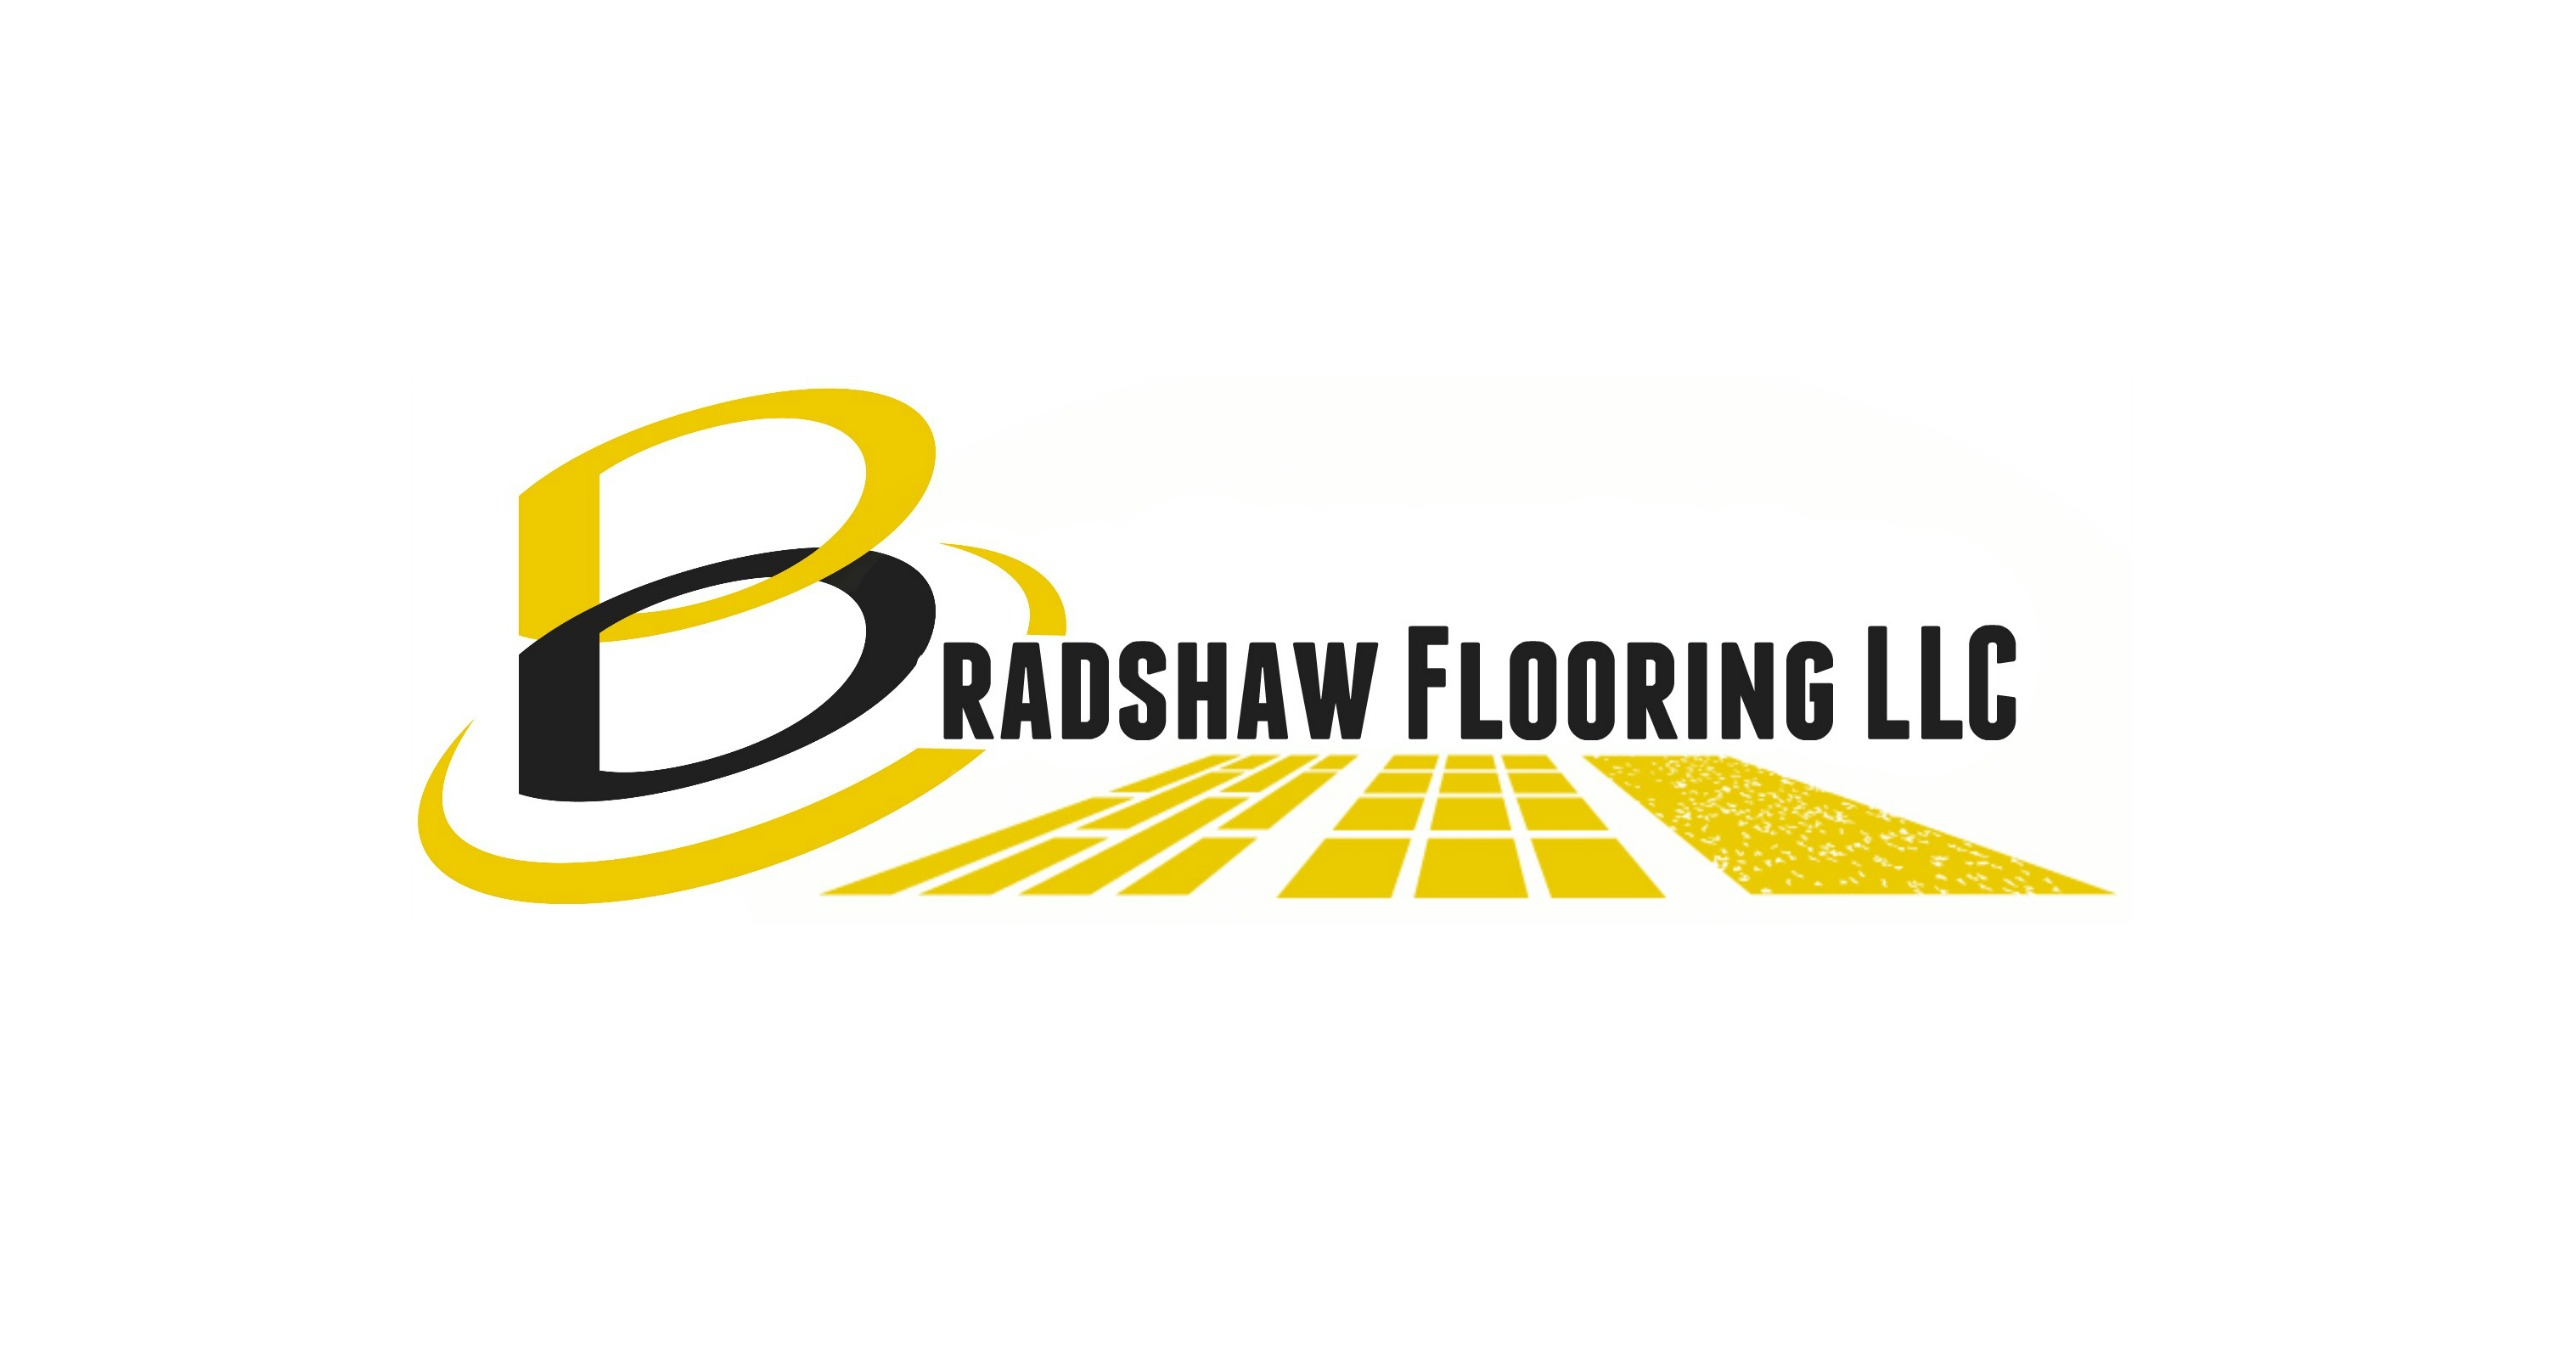 Bradshaw Flooring